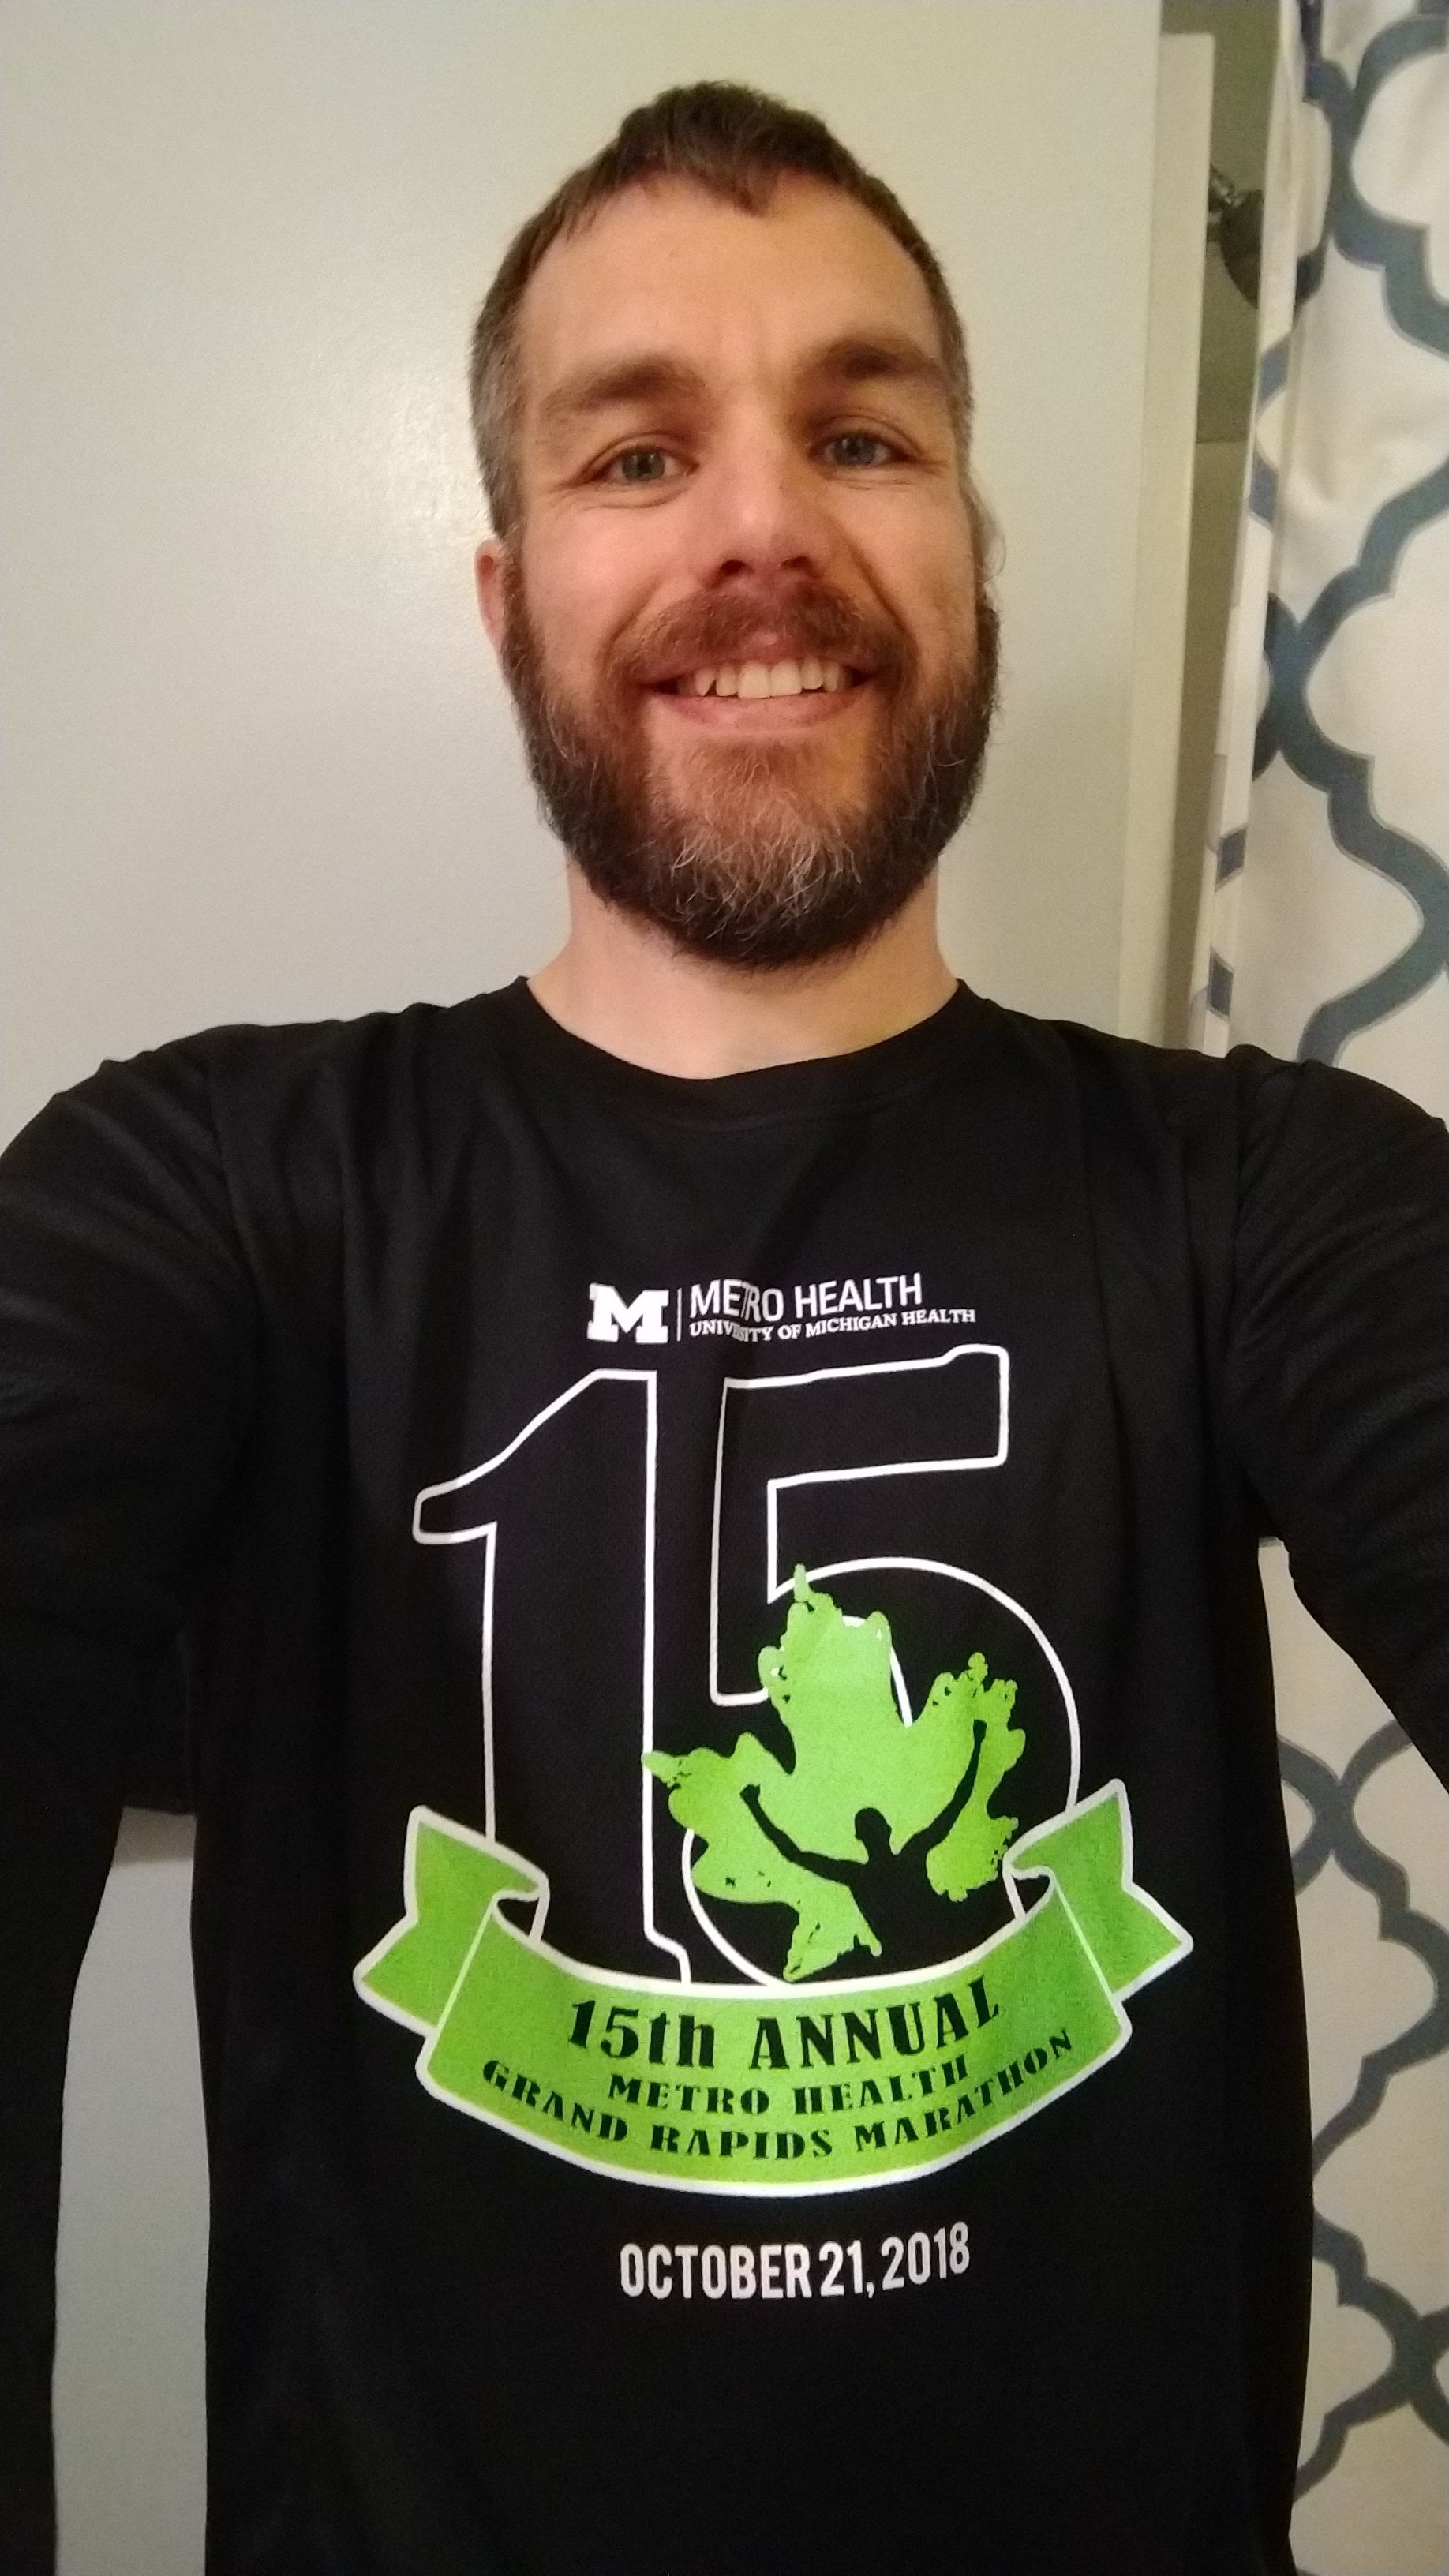 Day Before The Big Run, Grand Rapids Marathon 2018